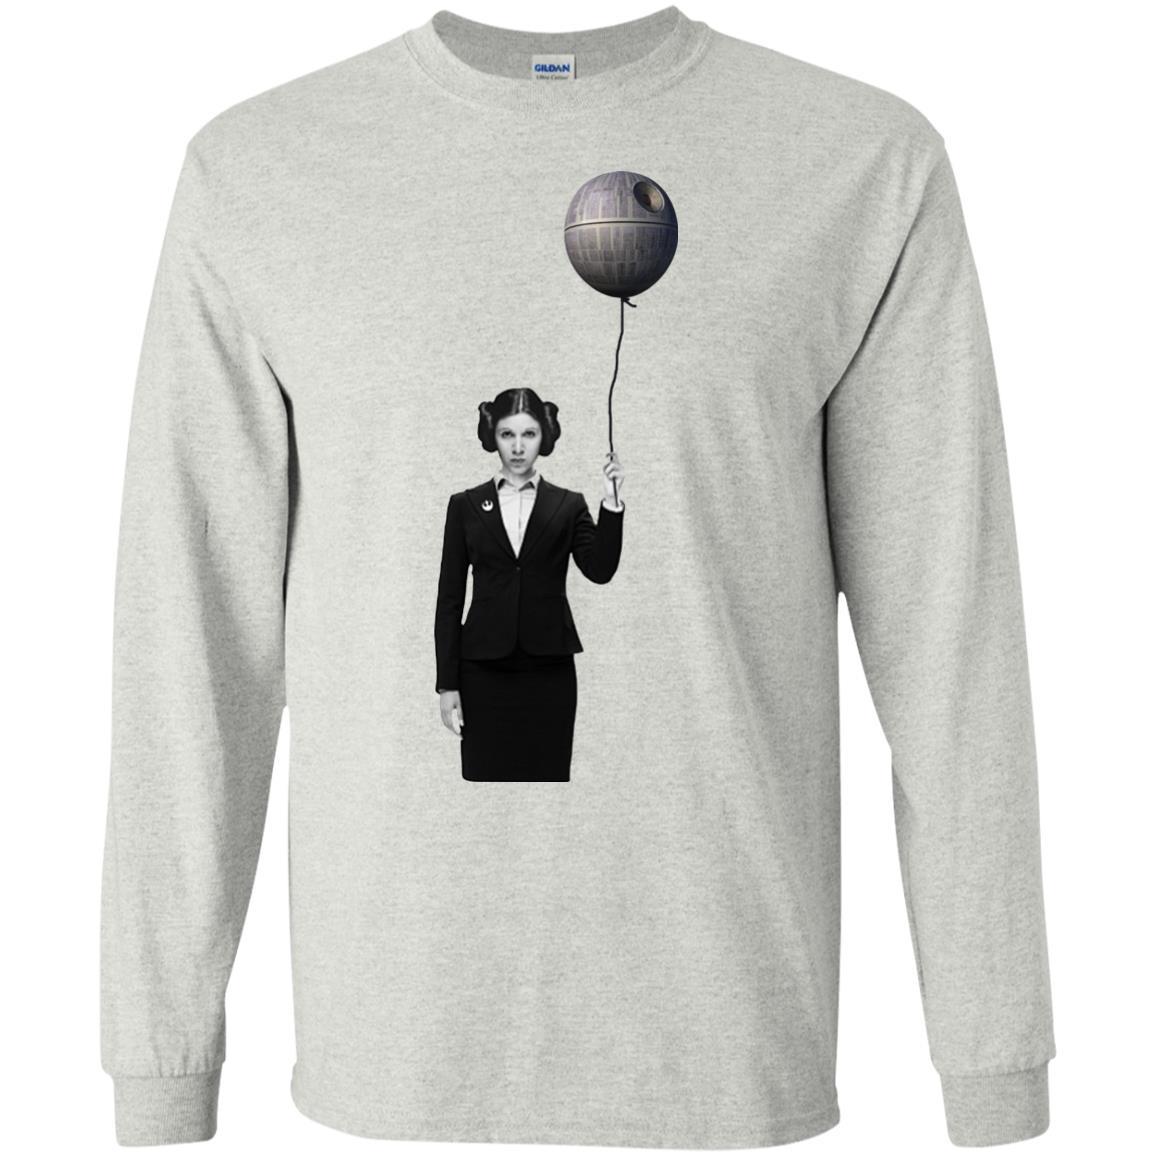 Princess Leia Death Star Shirt, Sweatshirt, Hoodie - Rockatee Old Princess Leia Shirts